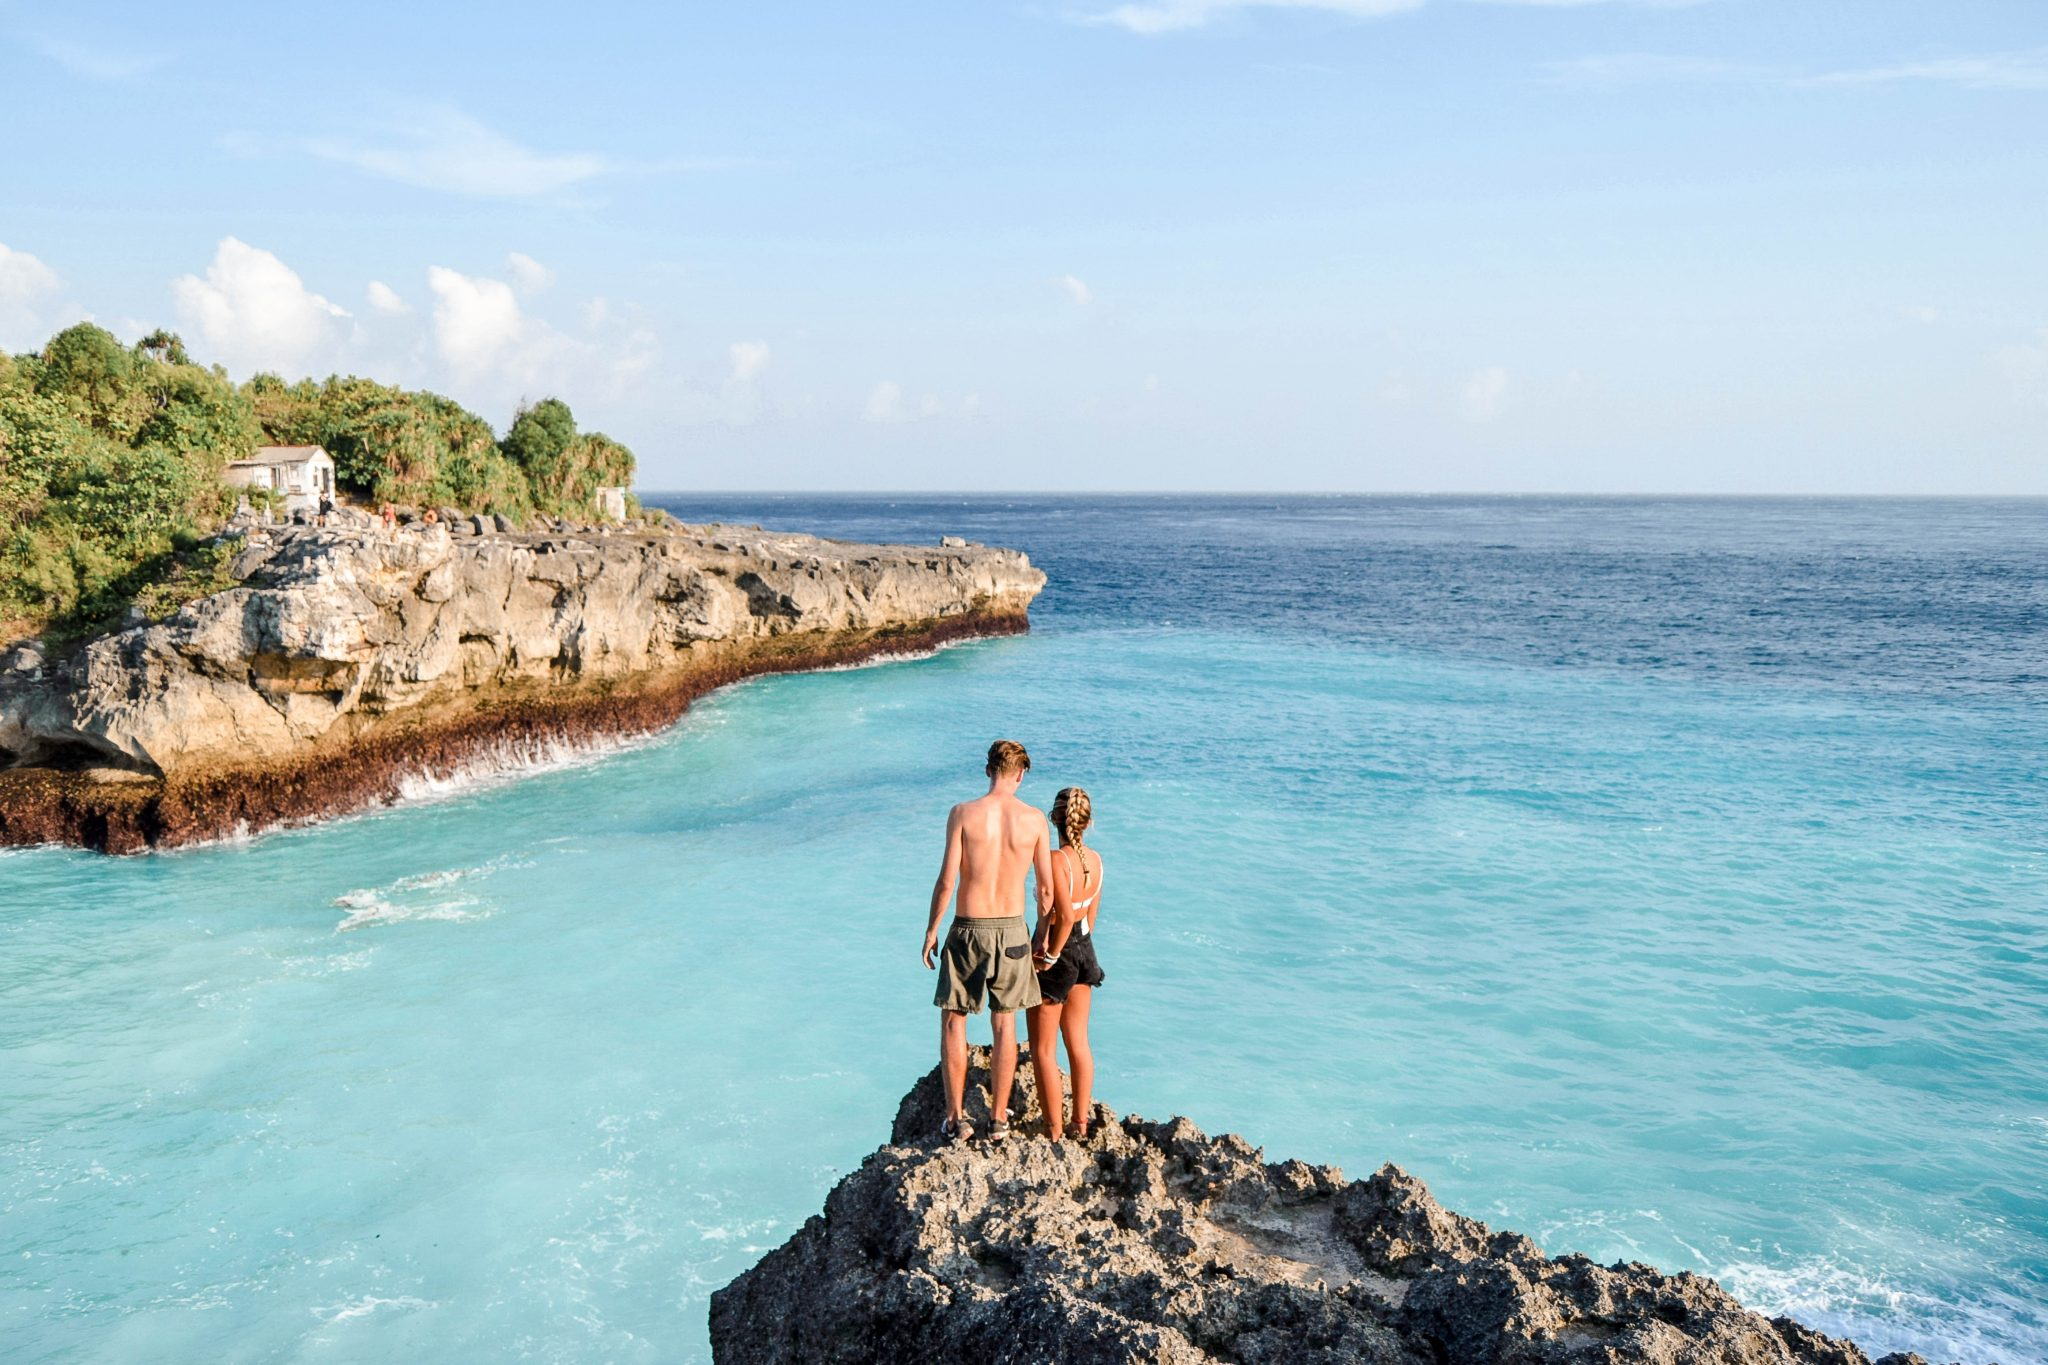 Wanderers & Warriors - Charlie & Lauren UK Travel Couple - Blue Lagoon Nusa Ceningan Bali - Blue Lagoon Bali - Cliff Jumping Nusa Ceningan - Blue Lagoon Nusa Lembongan - Cliffs In Nusa Ceningan - things to do in nusa Lembongan - things to do in nusa ceningan - Nusa Islands